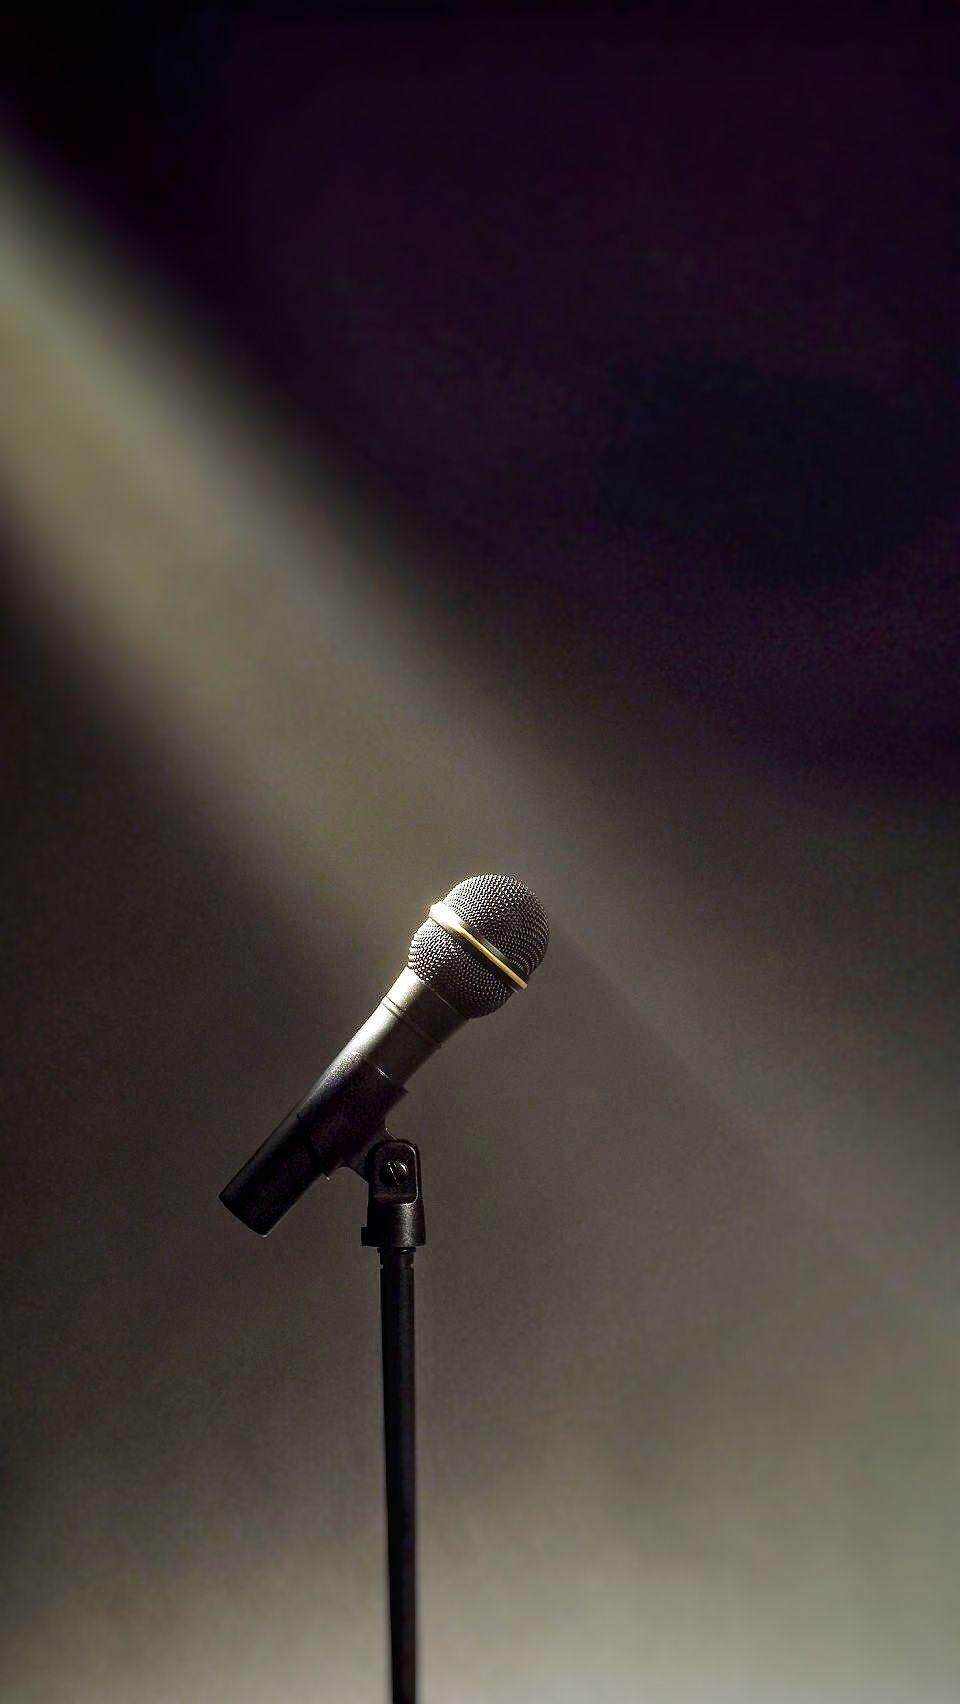 Microphone light iphone 7 wallpaper wallpaper in 2019 - Microphone wallpaper ...